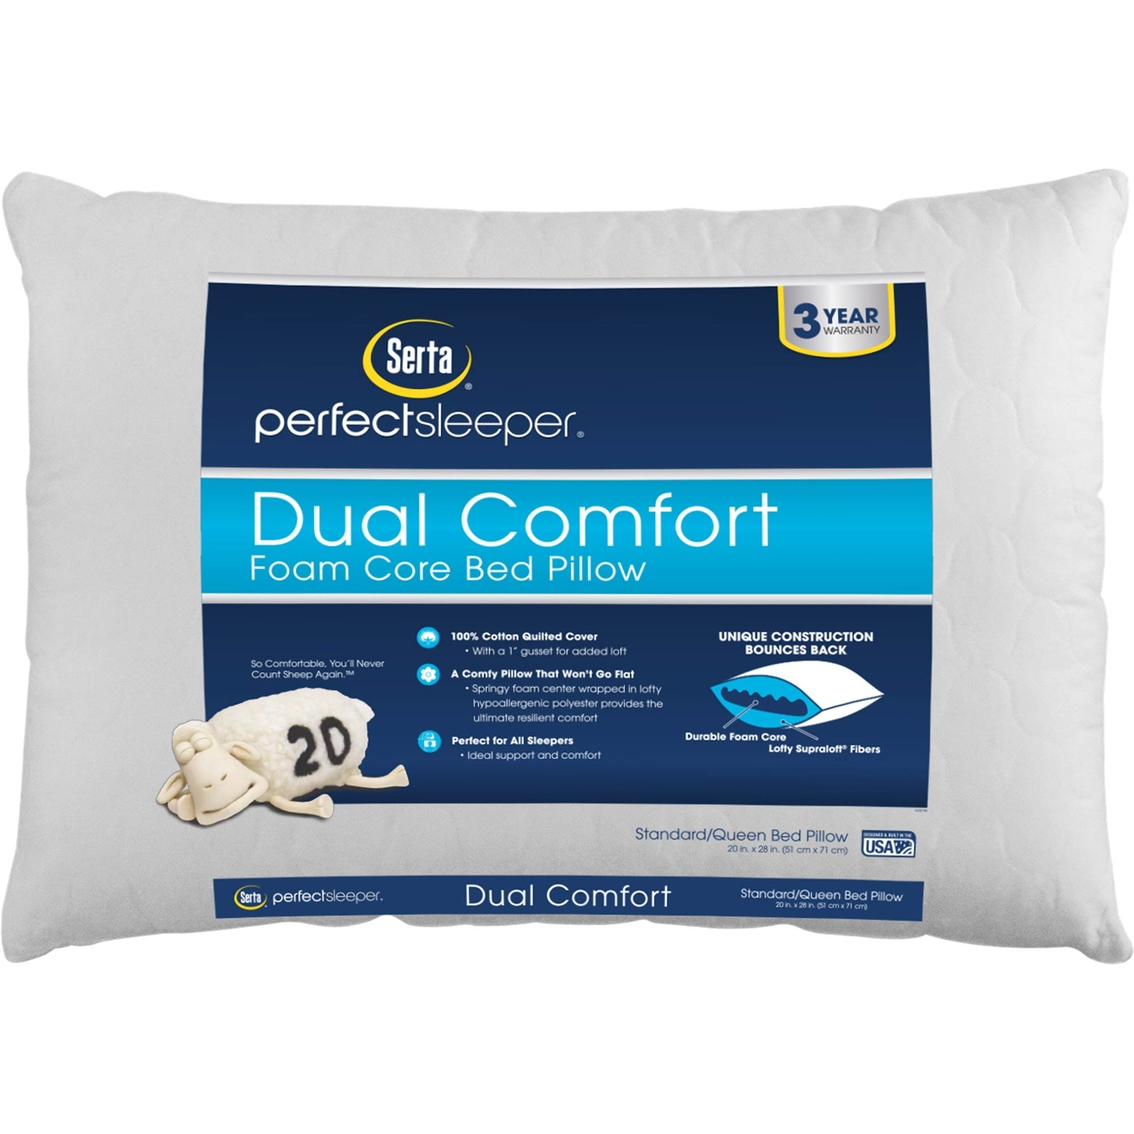 serta perfect sleeper dual comfort foam core bed pillow